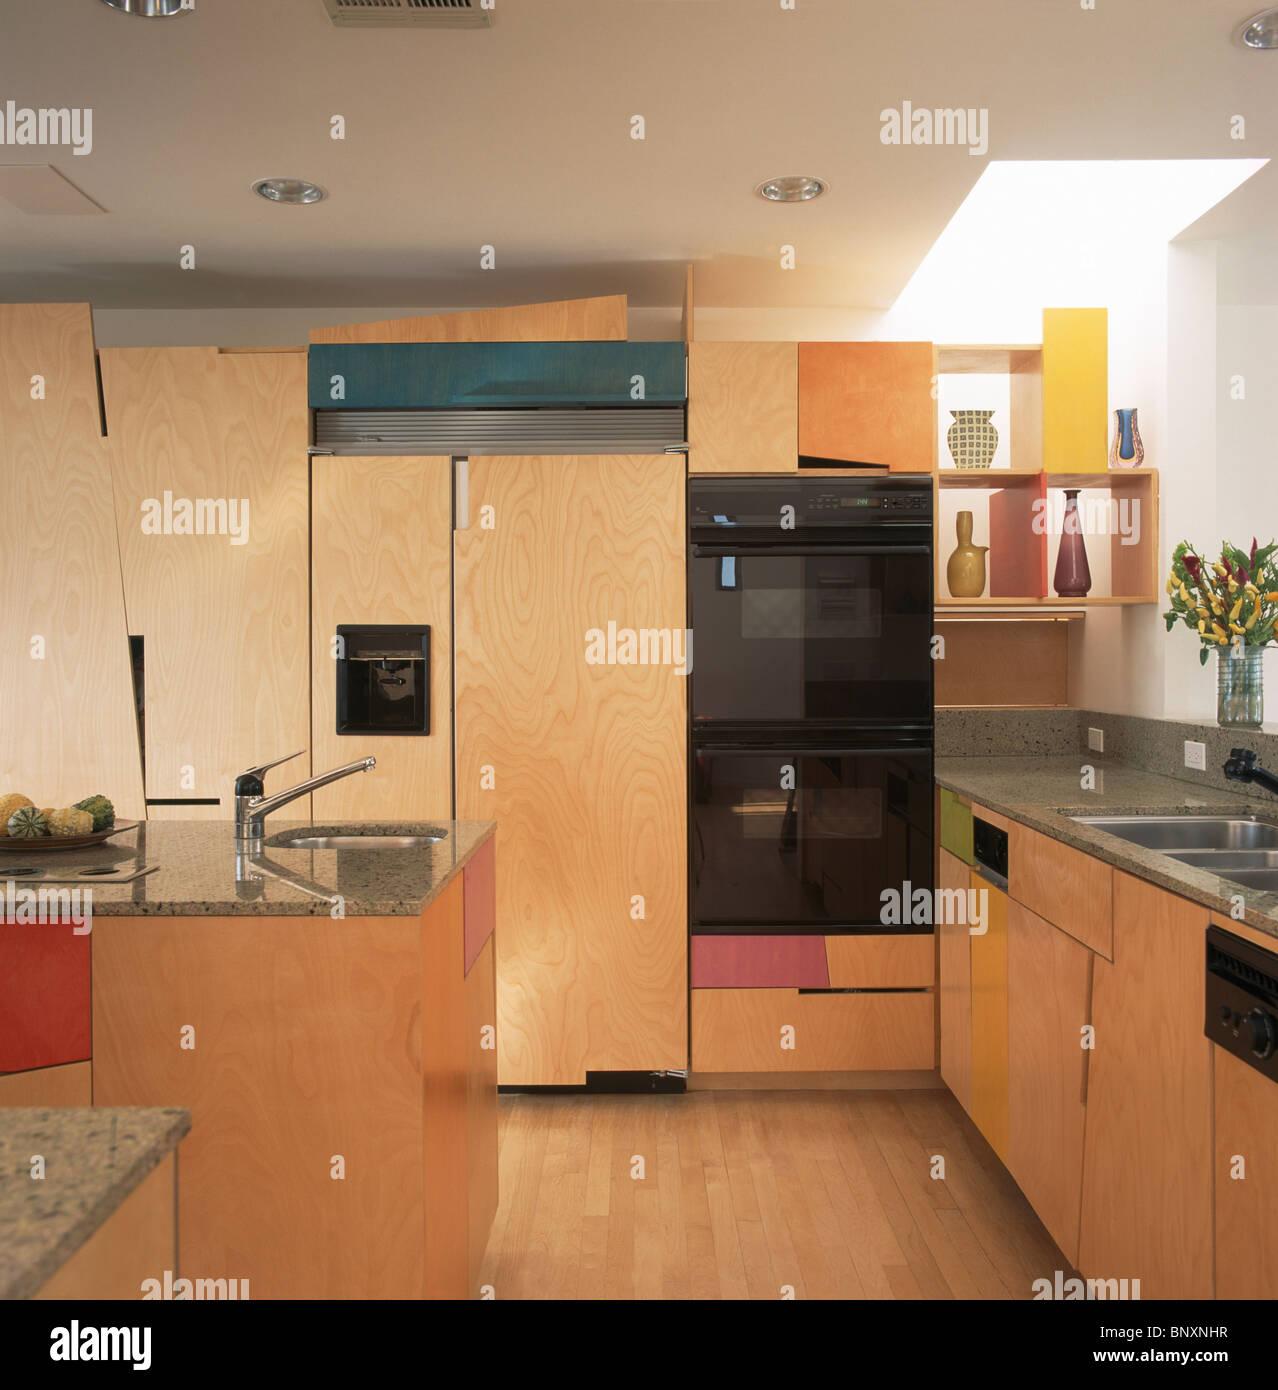 Large Capacity American Fridge Freezer Part - 47: Large White American-style Fridge-freezer And Eye-level Oven In Modern  Kitchen